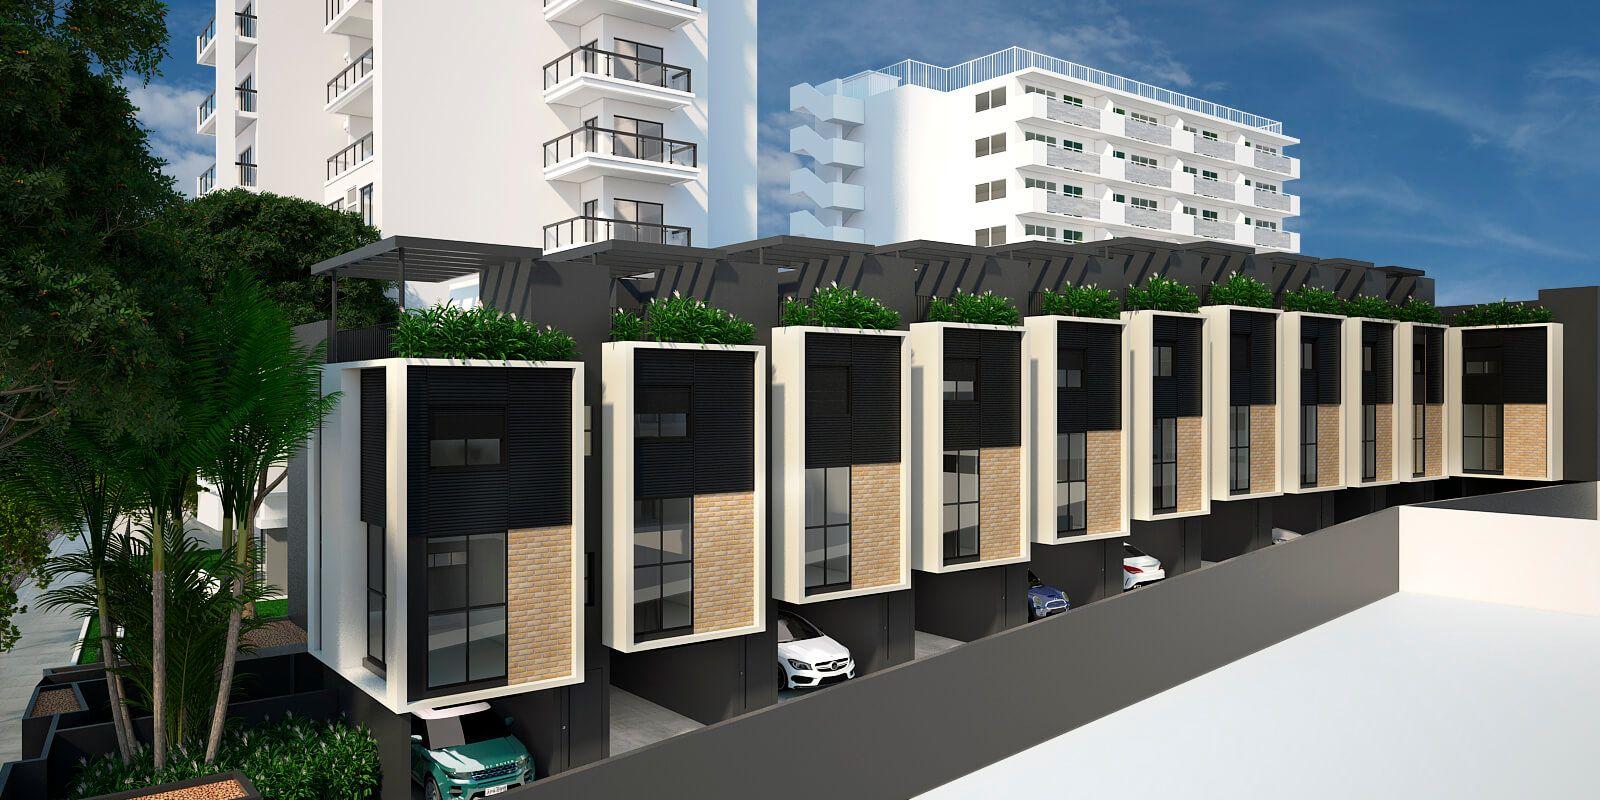 FACHADA das casas. O verde se estende dos canteiros arborizados, na entrada do condomínio, até os rooftops. Lazer e qualidade de vida para a sua família!